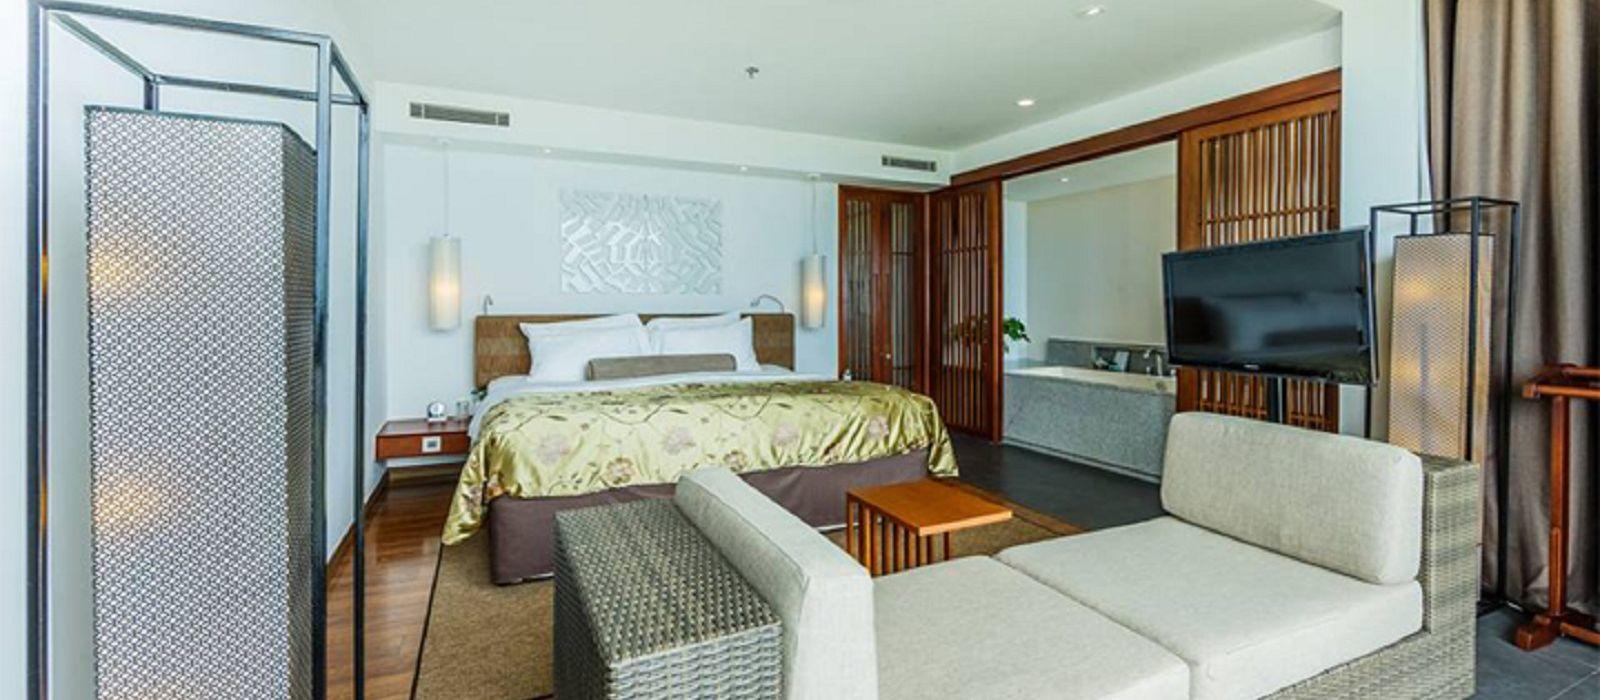 Hotel Sunrise Premium Resort & Spa, Hoi An Vietnam